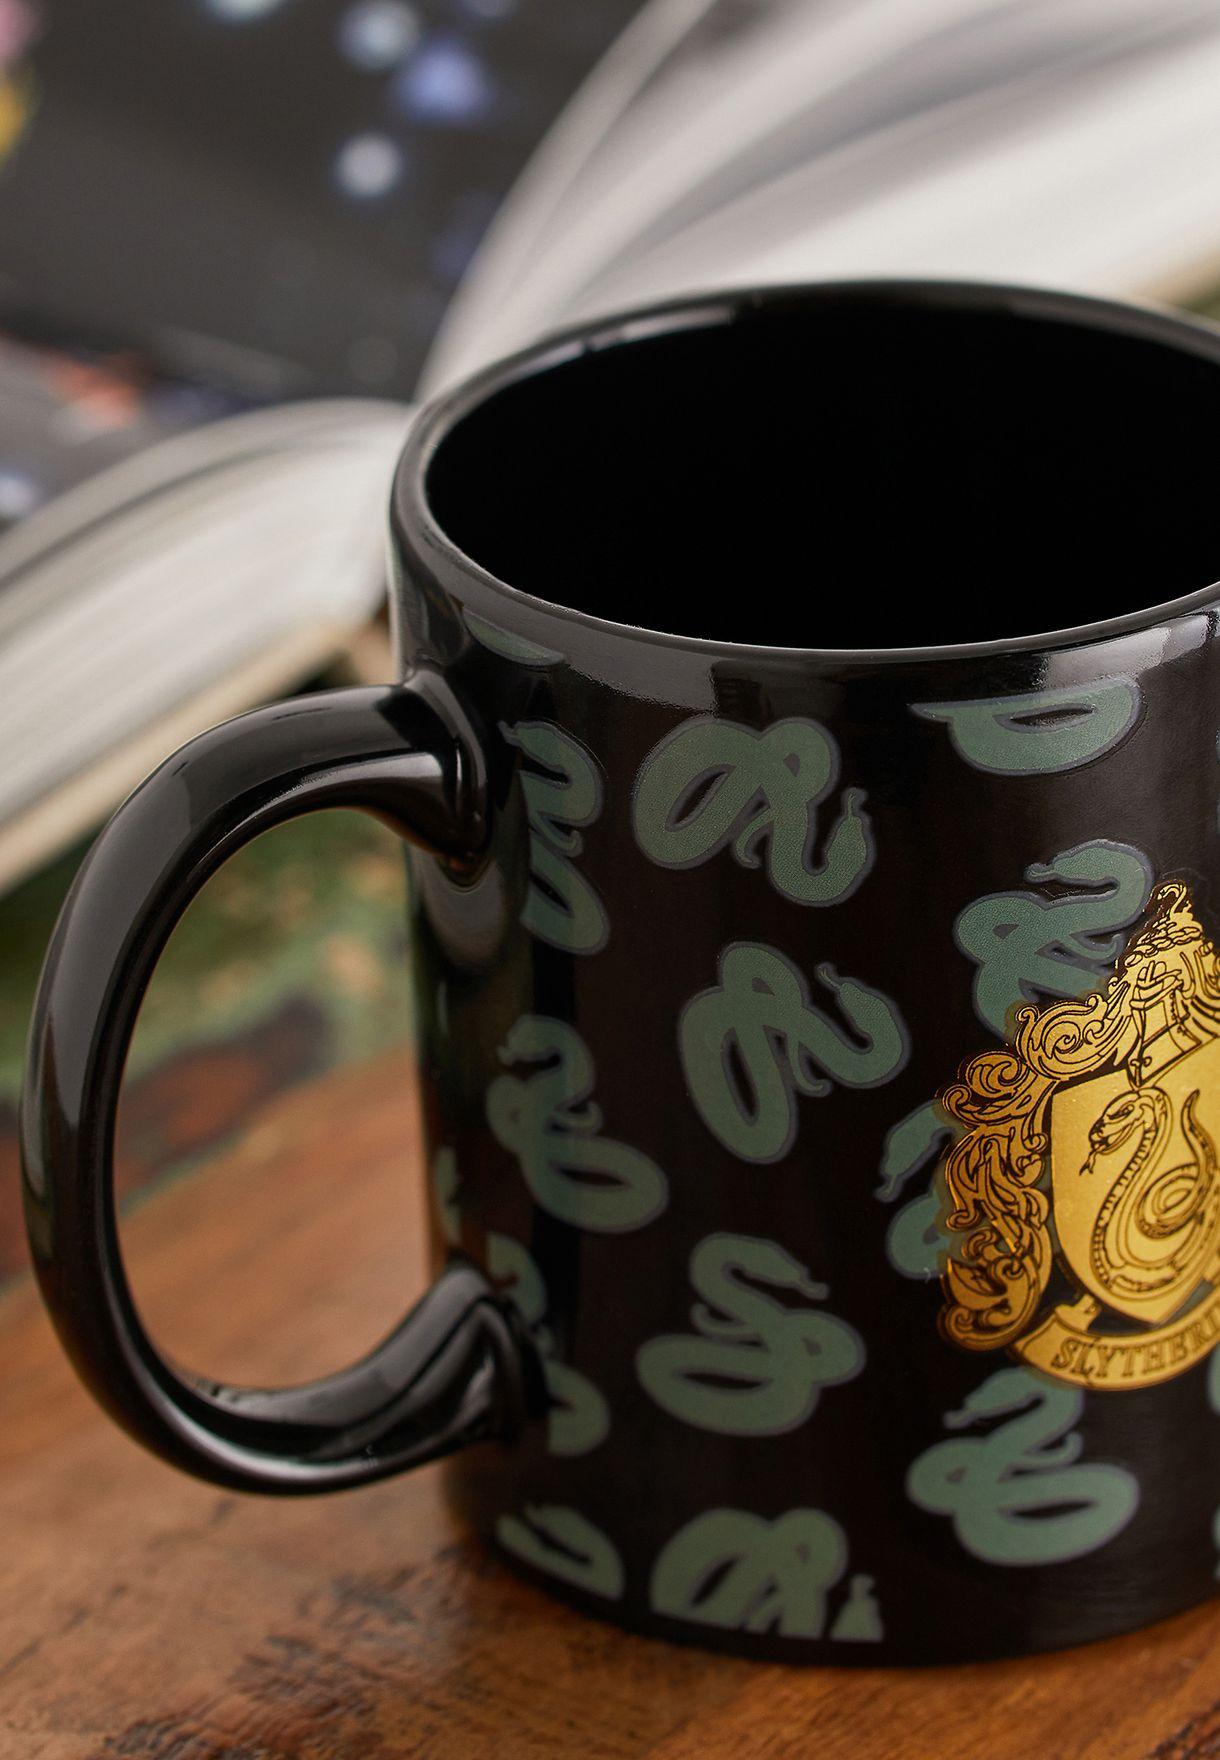 Harry Potter Hogwarts Slytherin House Heat change Mug